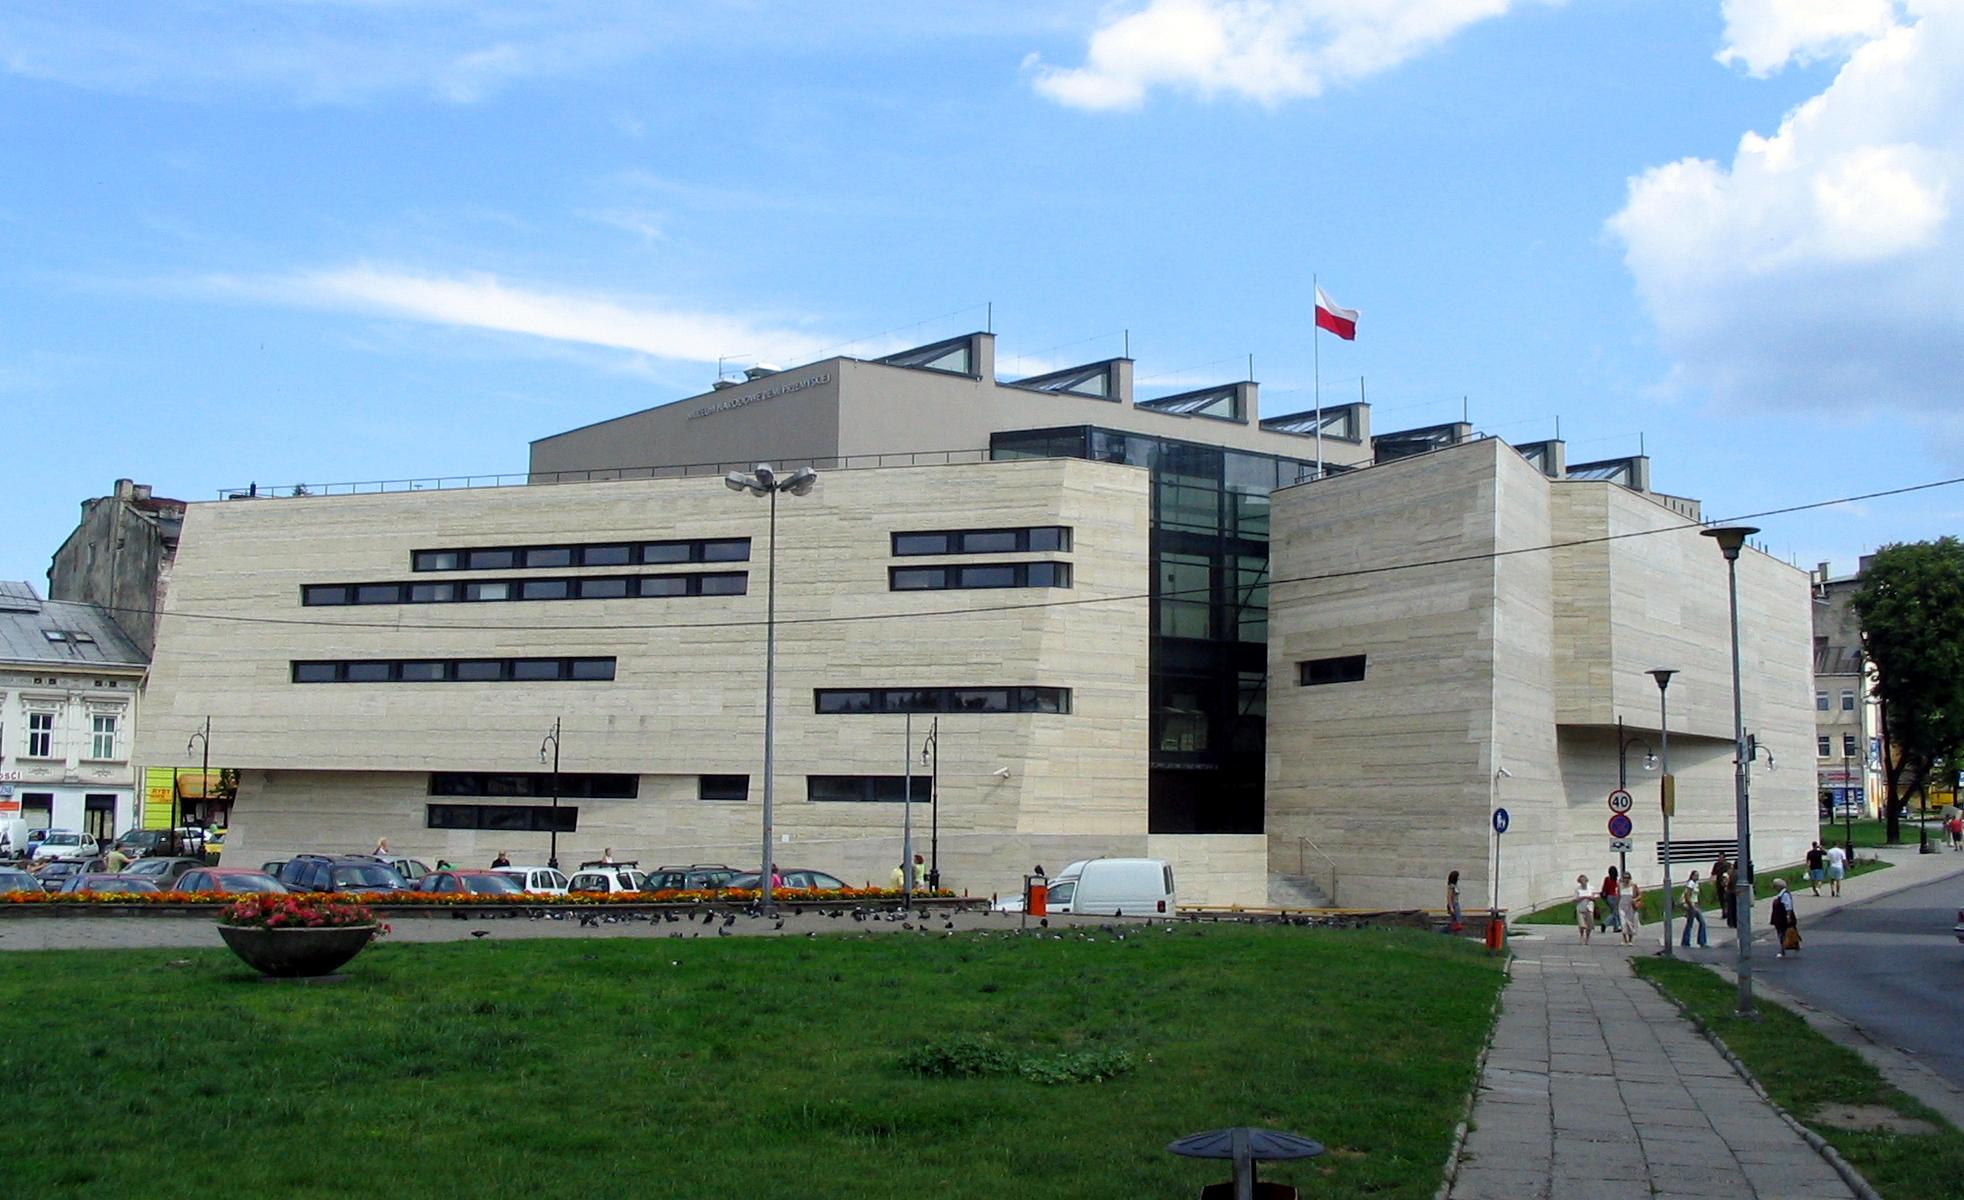 Muzea w polsce online dating